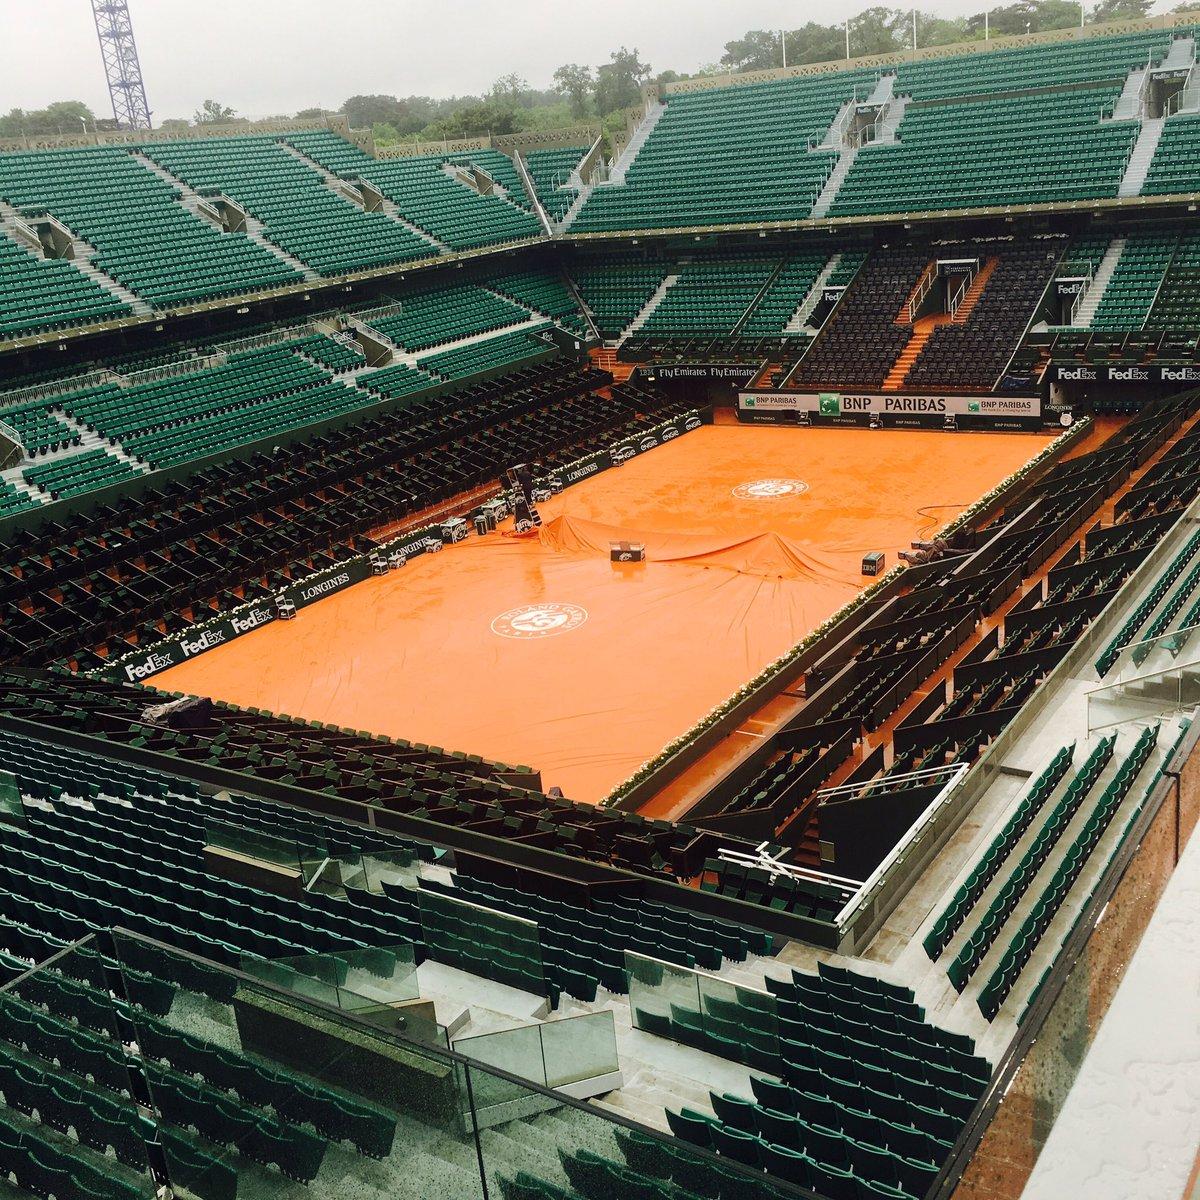 Calendario Roland Garros 2020.Tennis Stadiums Pagina 50 Skyscrapercity